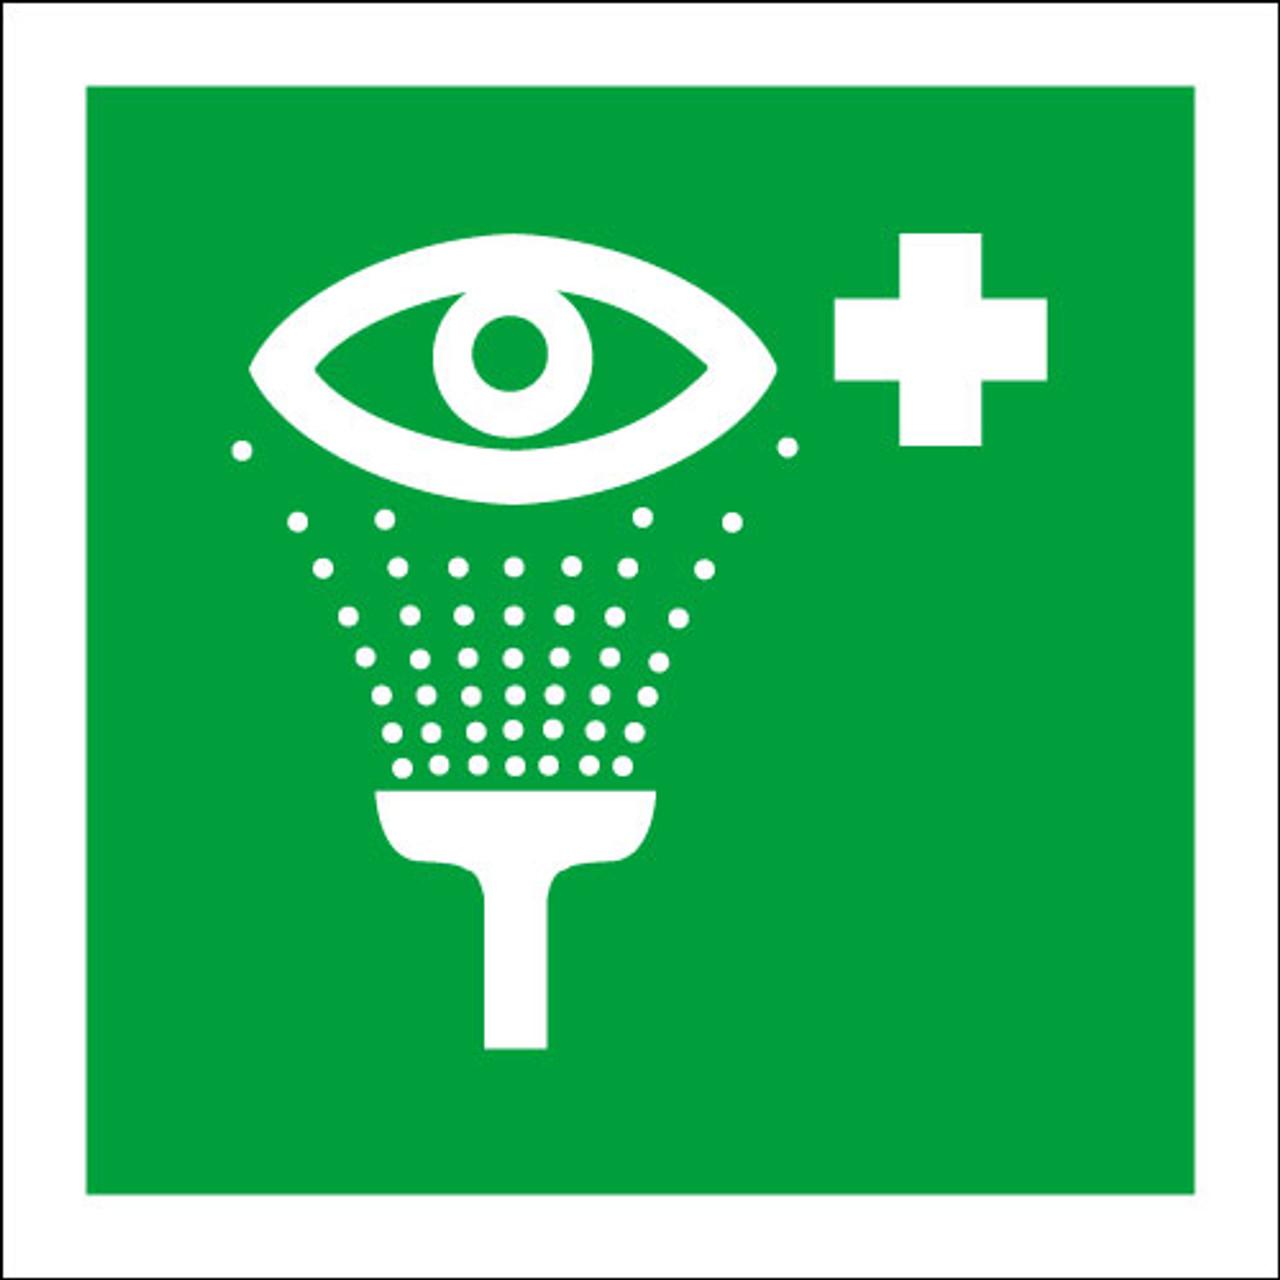 Eye wash safety sign